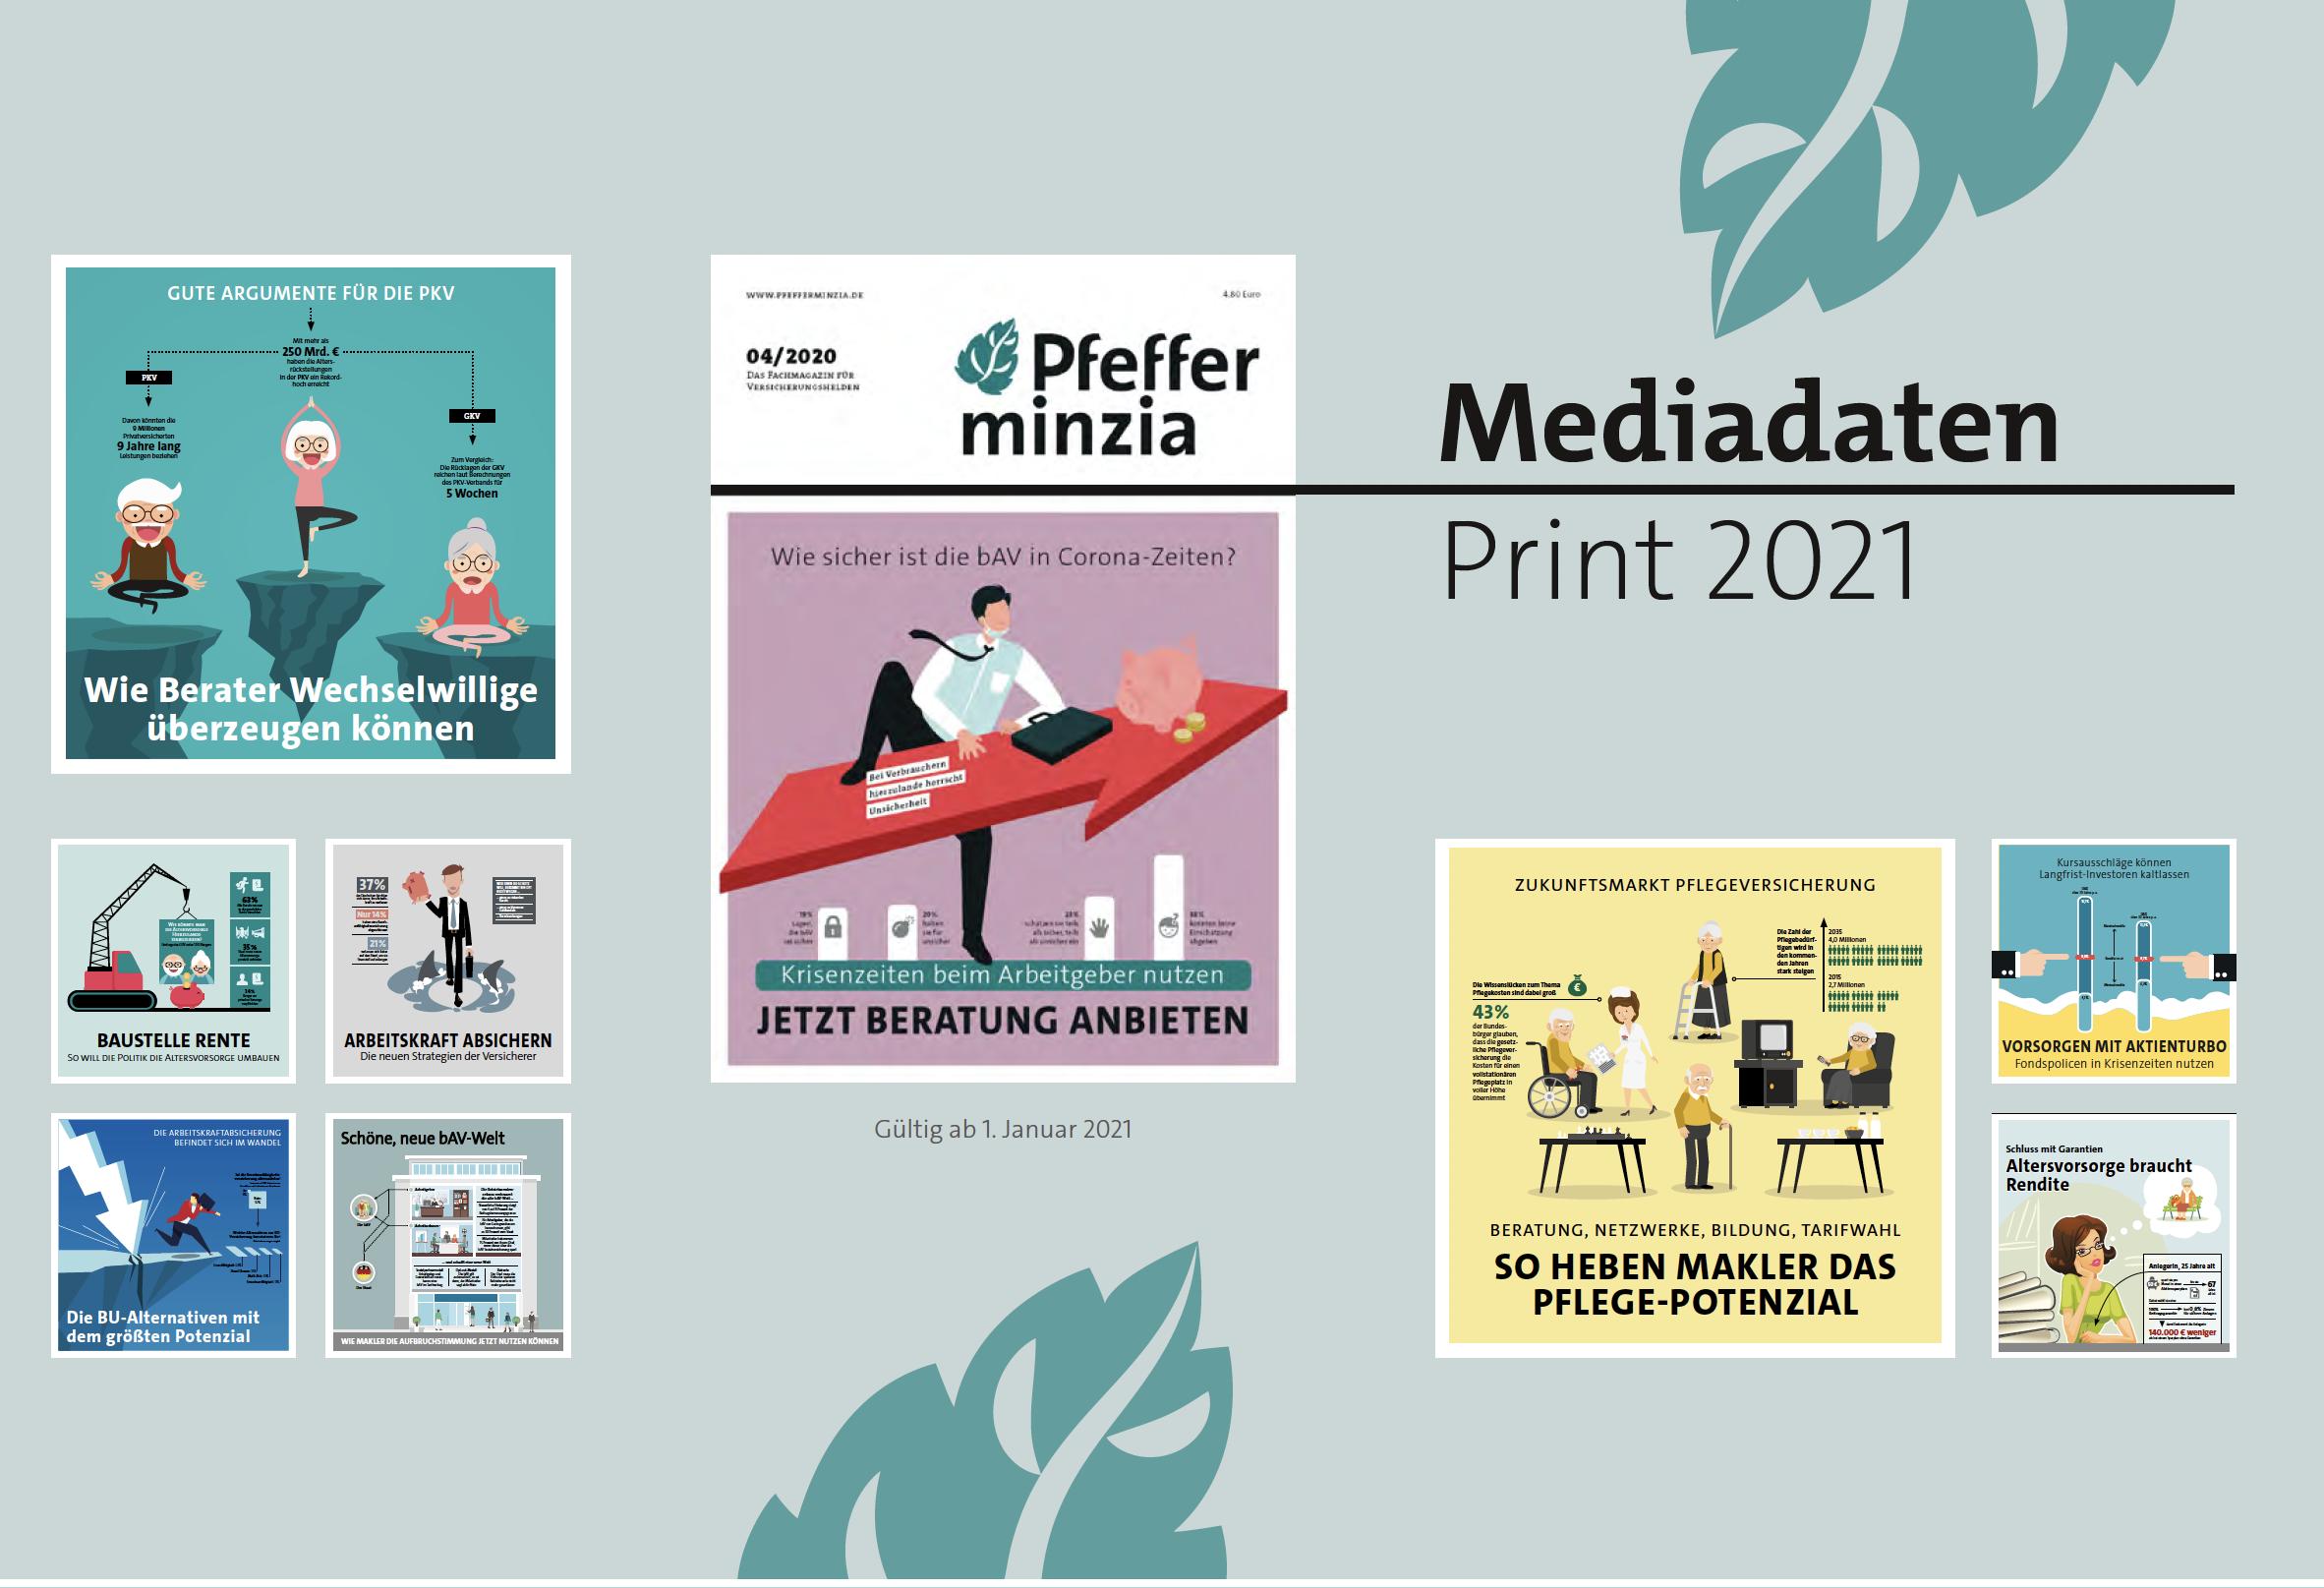 mediadaten-online